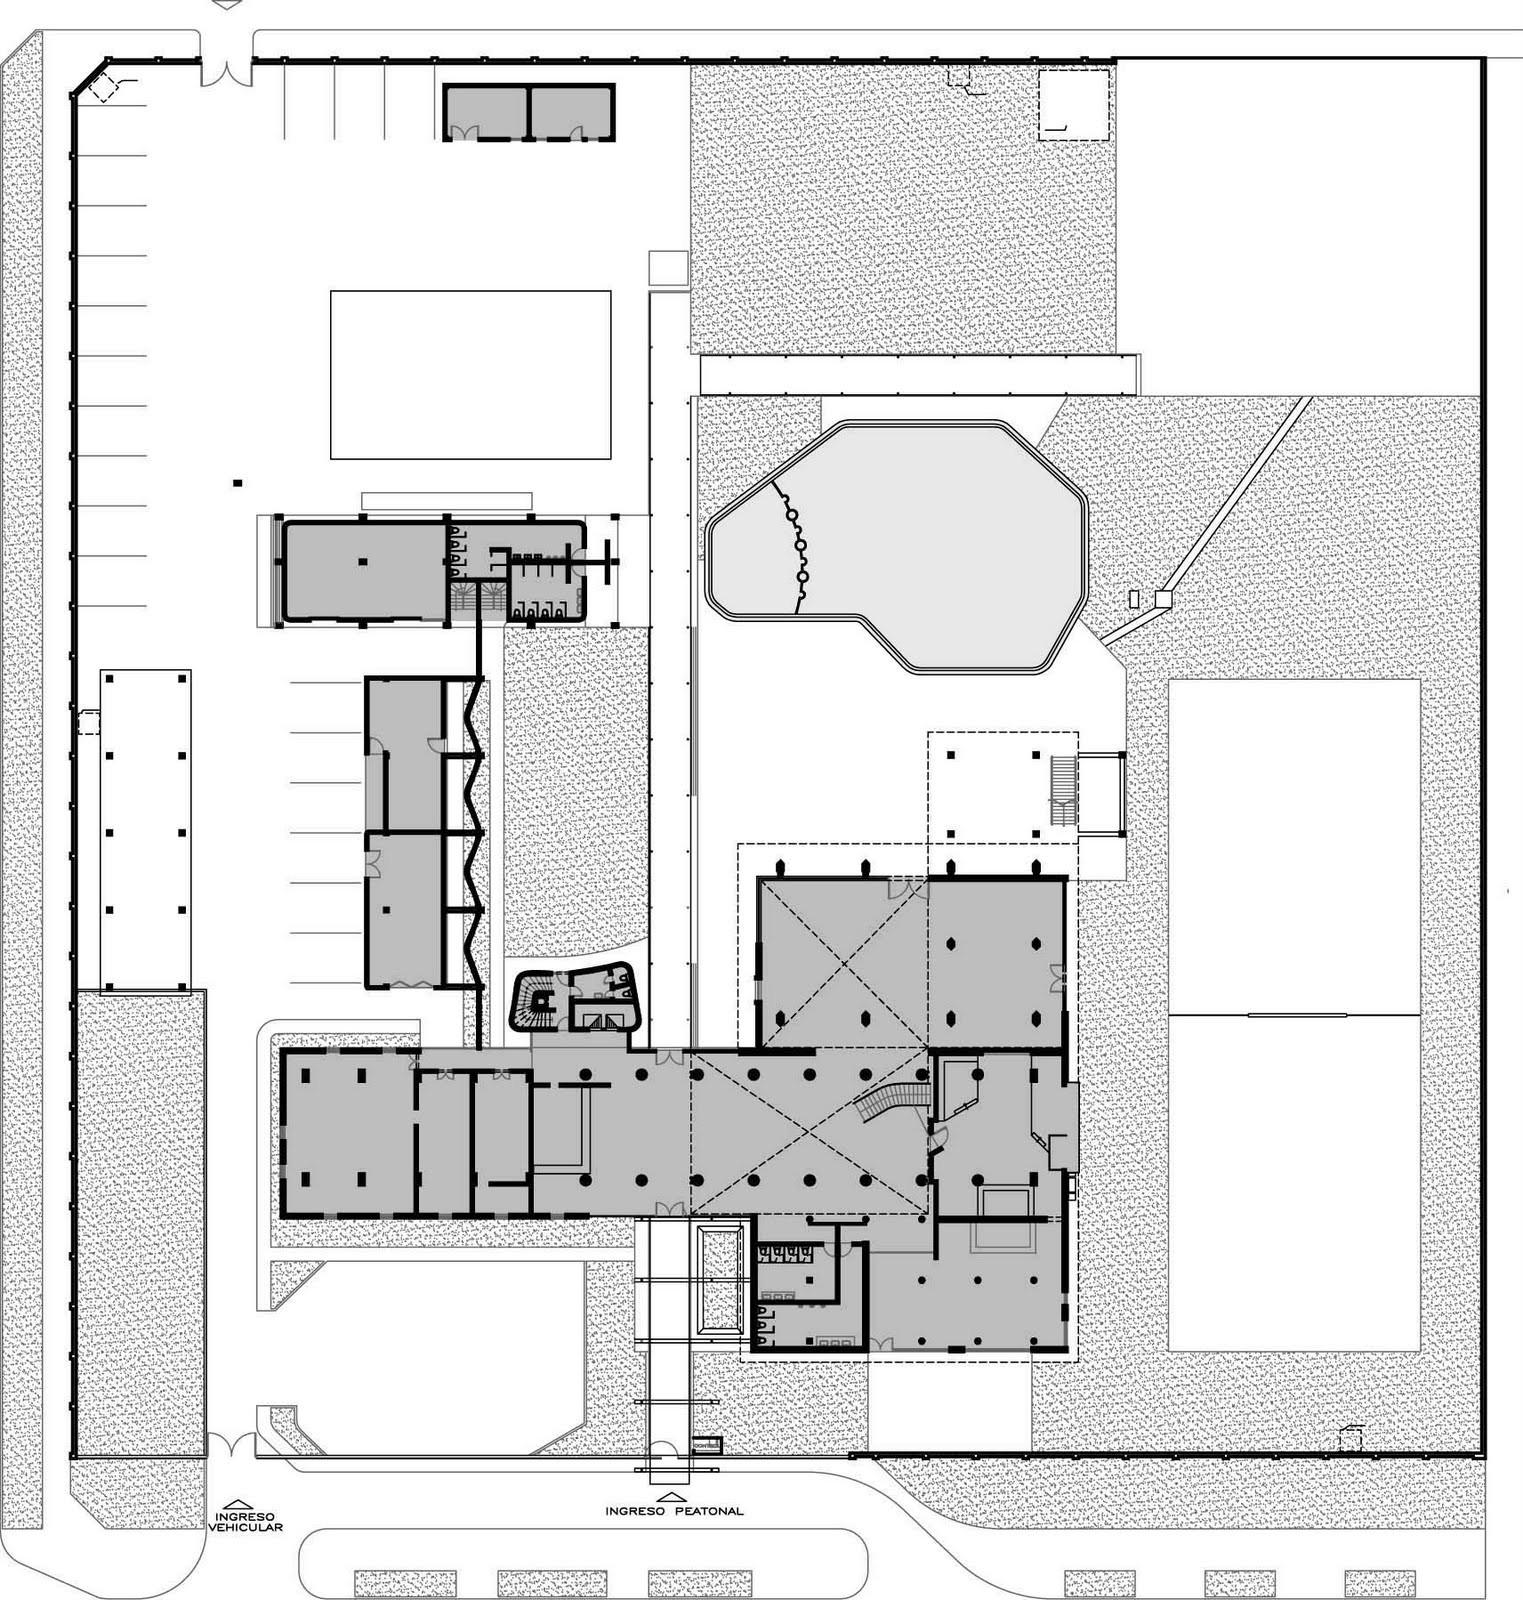 Galer a de cl sicos de arquitectura residencia fap for Arquitectura para la educacion pdf